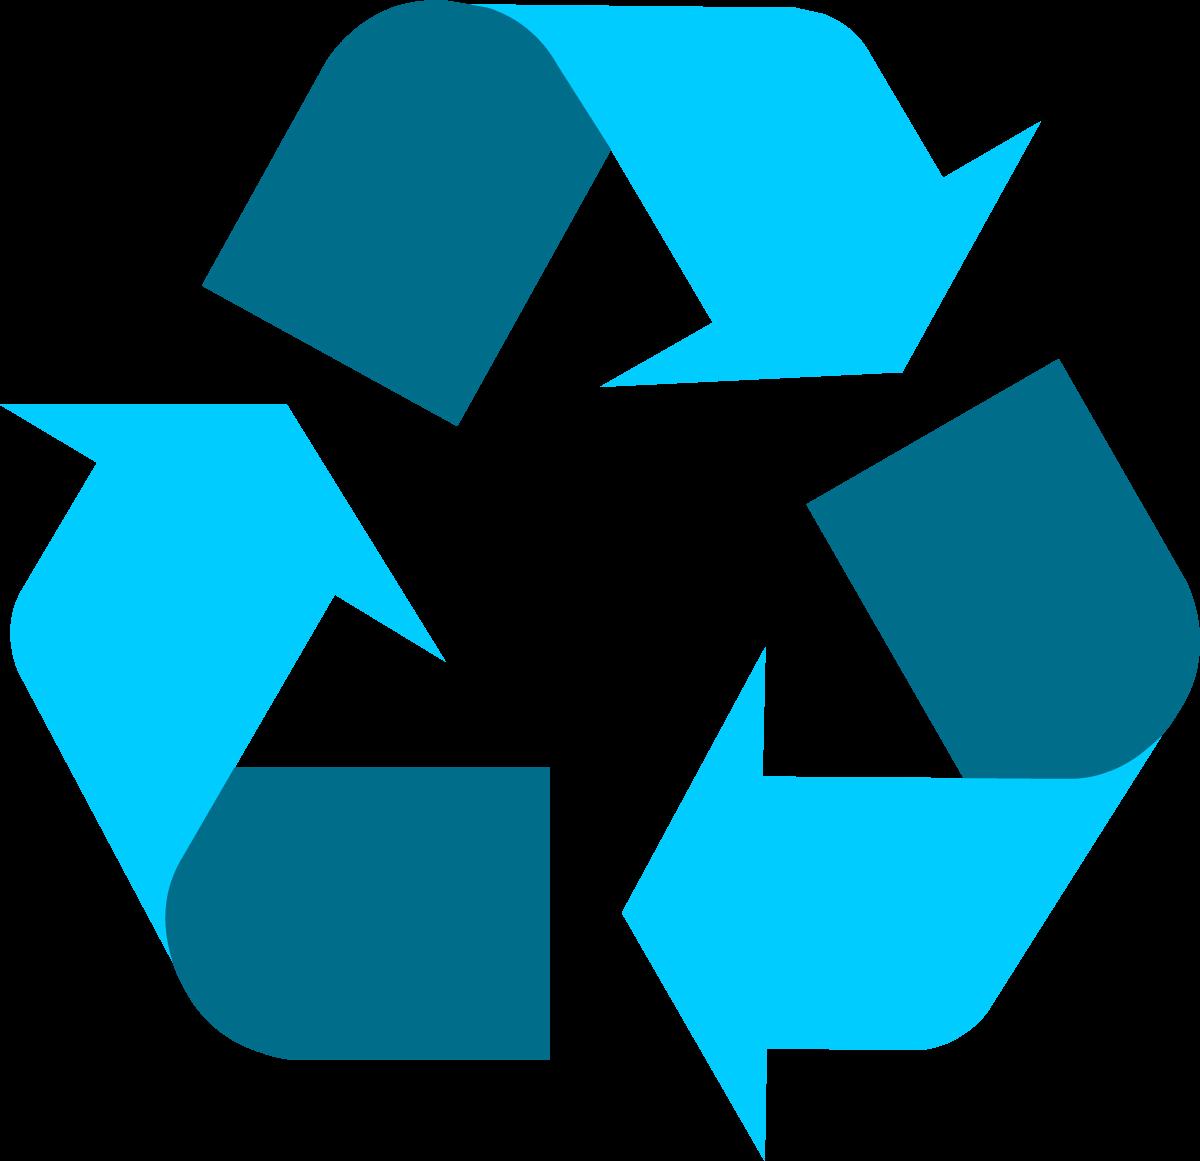 Light blue universal recycling symbol logo sign httpwww light blue universal recycling symbol logo sign http biocorpaavc Gallery